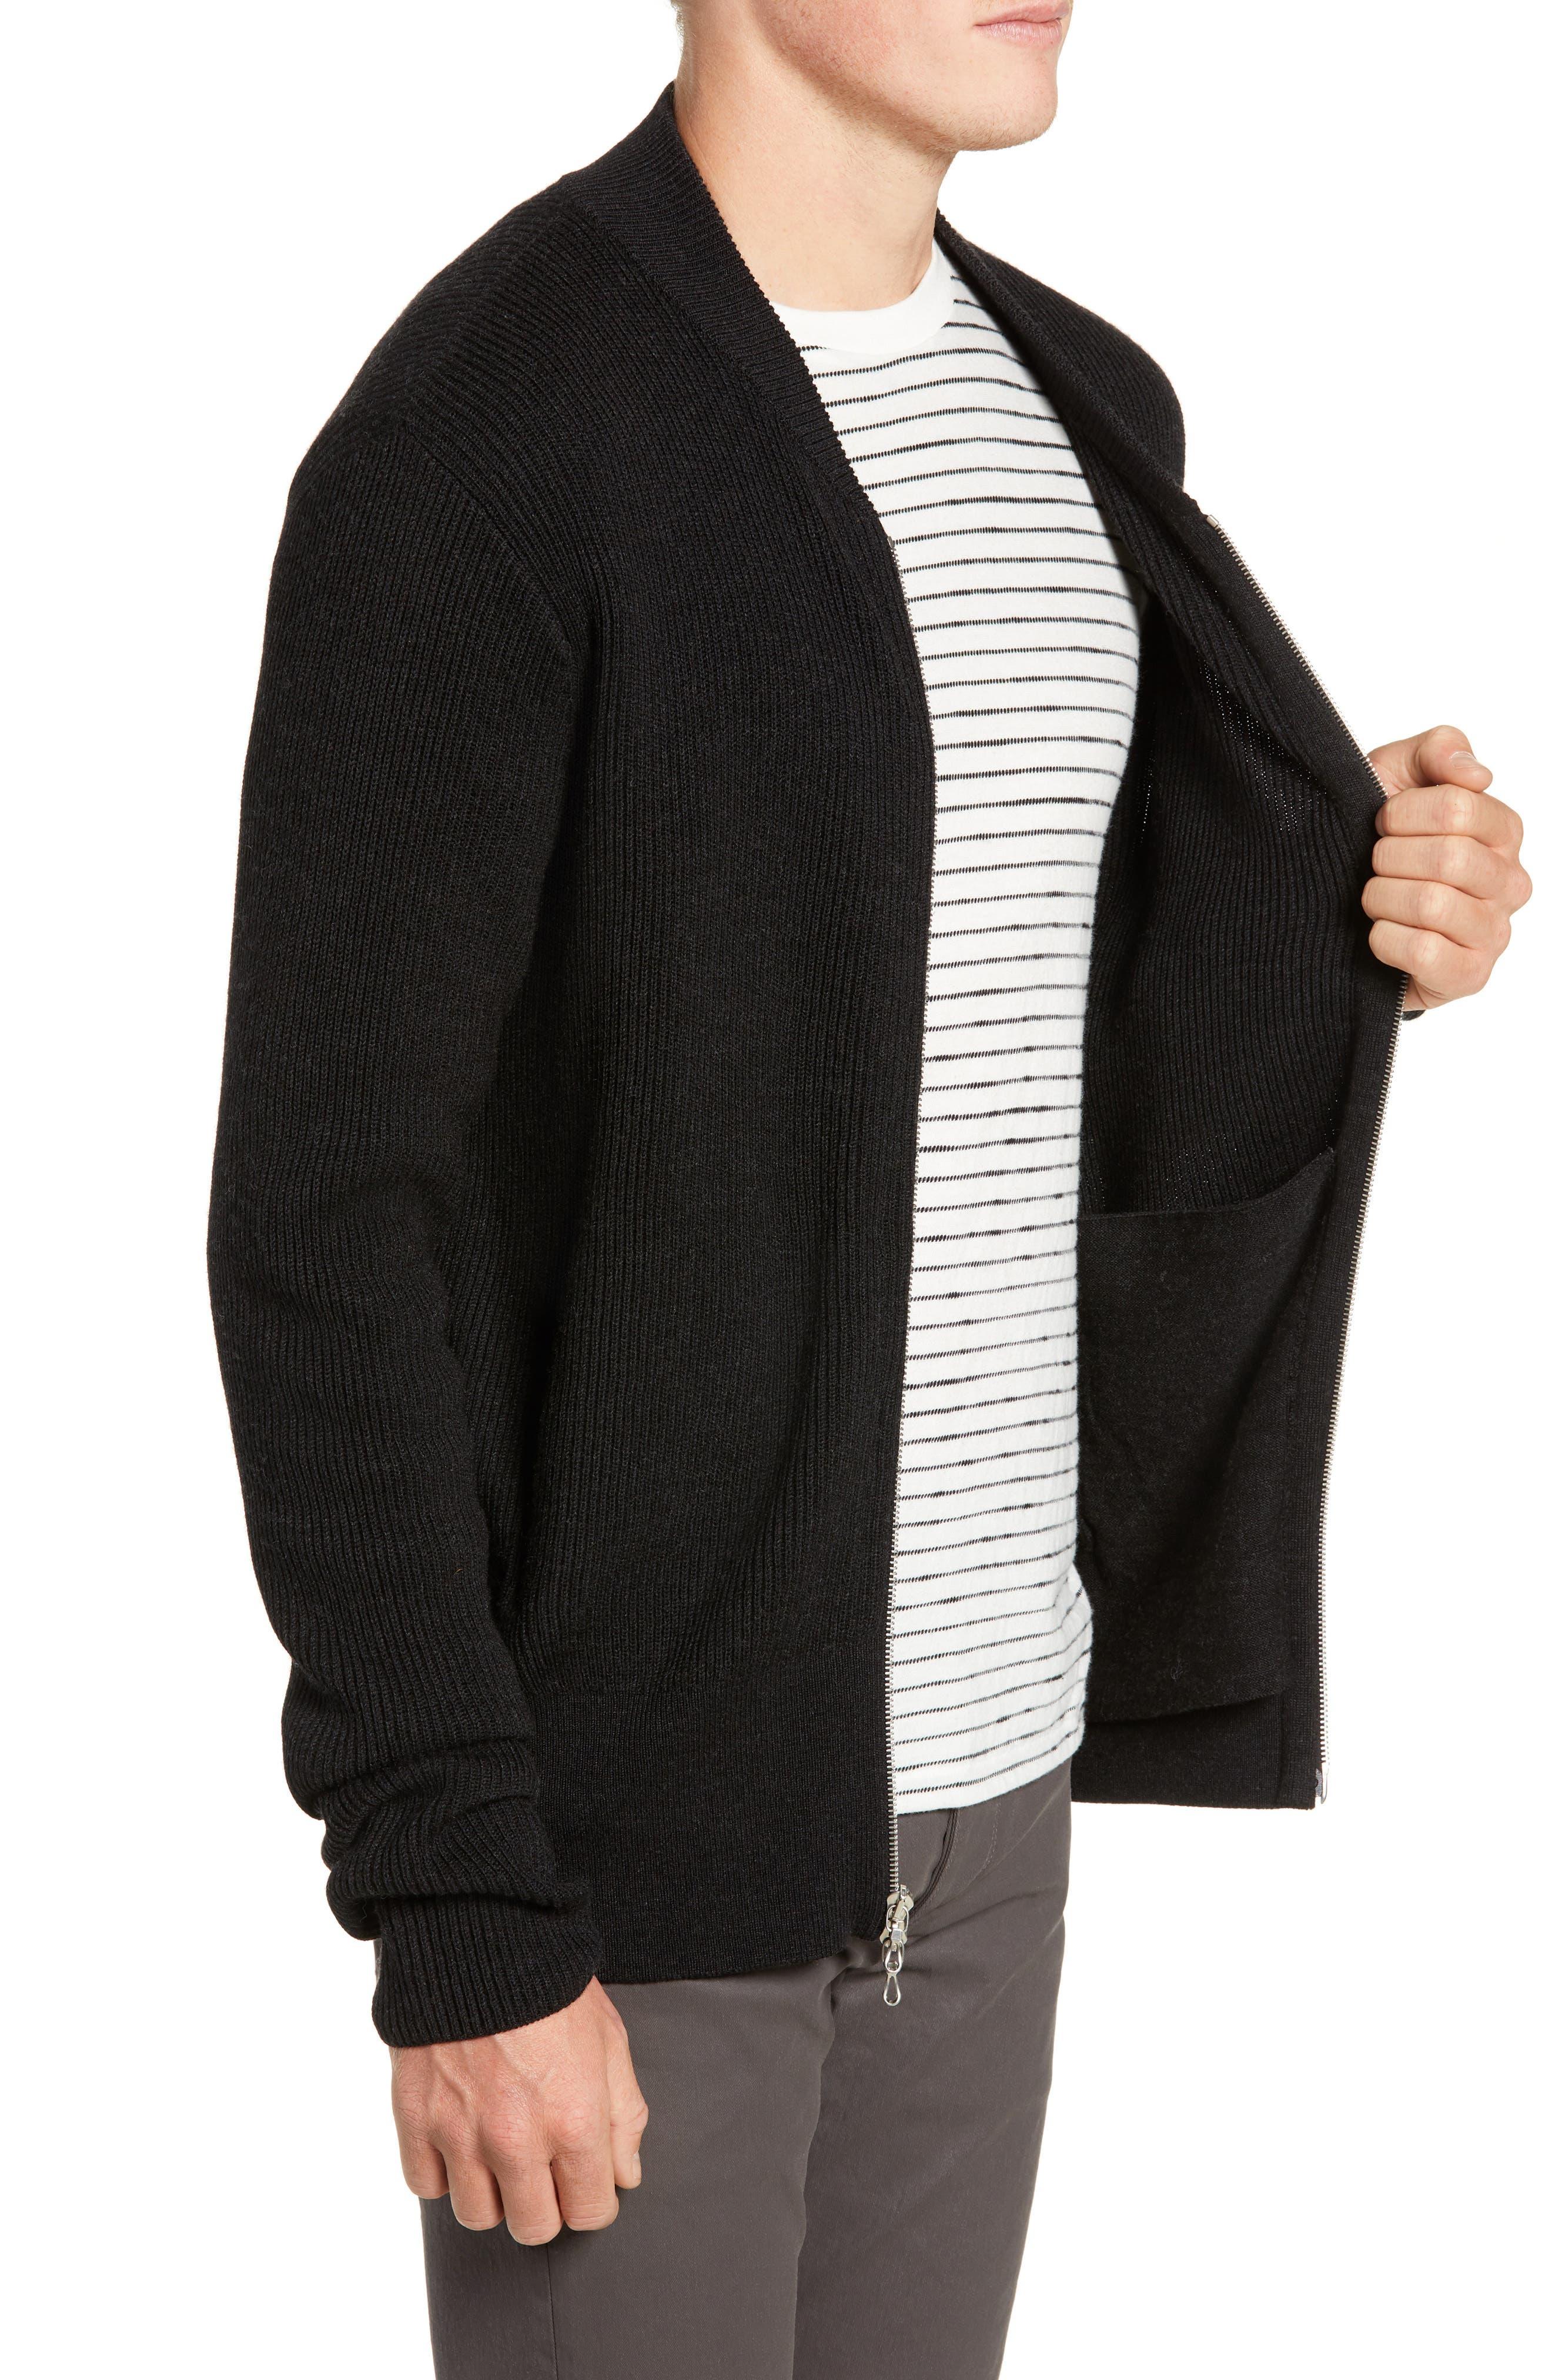 RAG & BONE, Andrew Zip Front Merino Wool Sweater, Alternate thumbnail 3, color, BLACK HEATHER